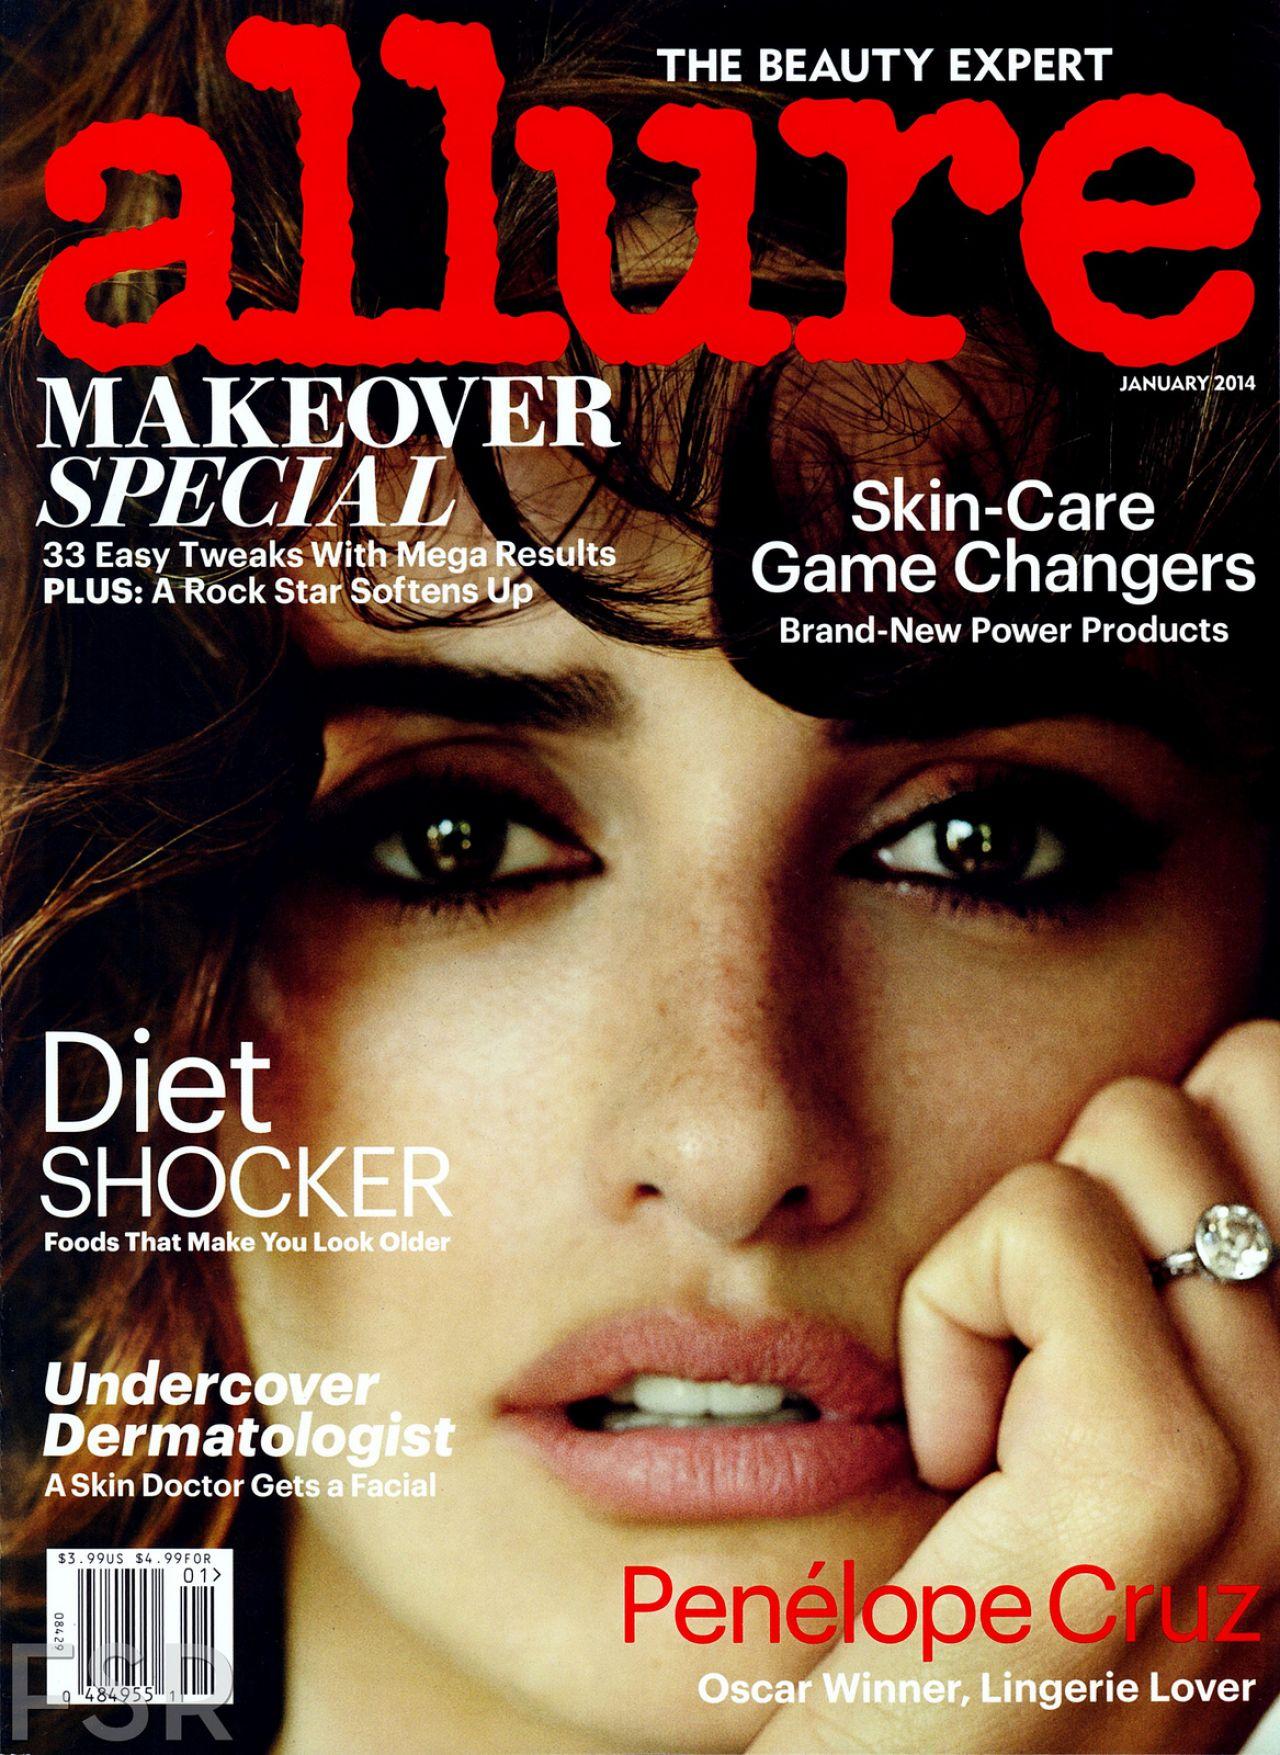 Penelope Cruz - ALLURE Magazine - January 2014 Issue